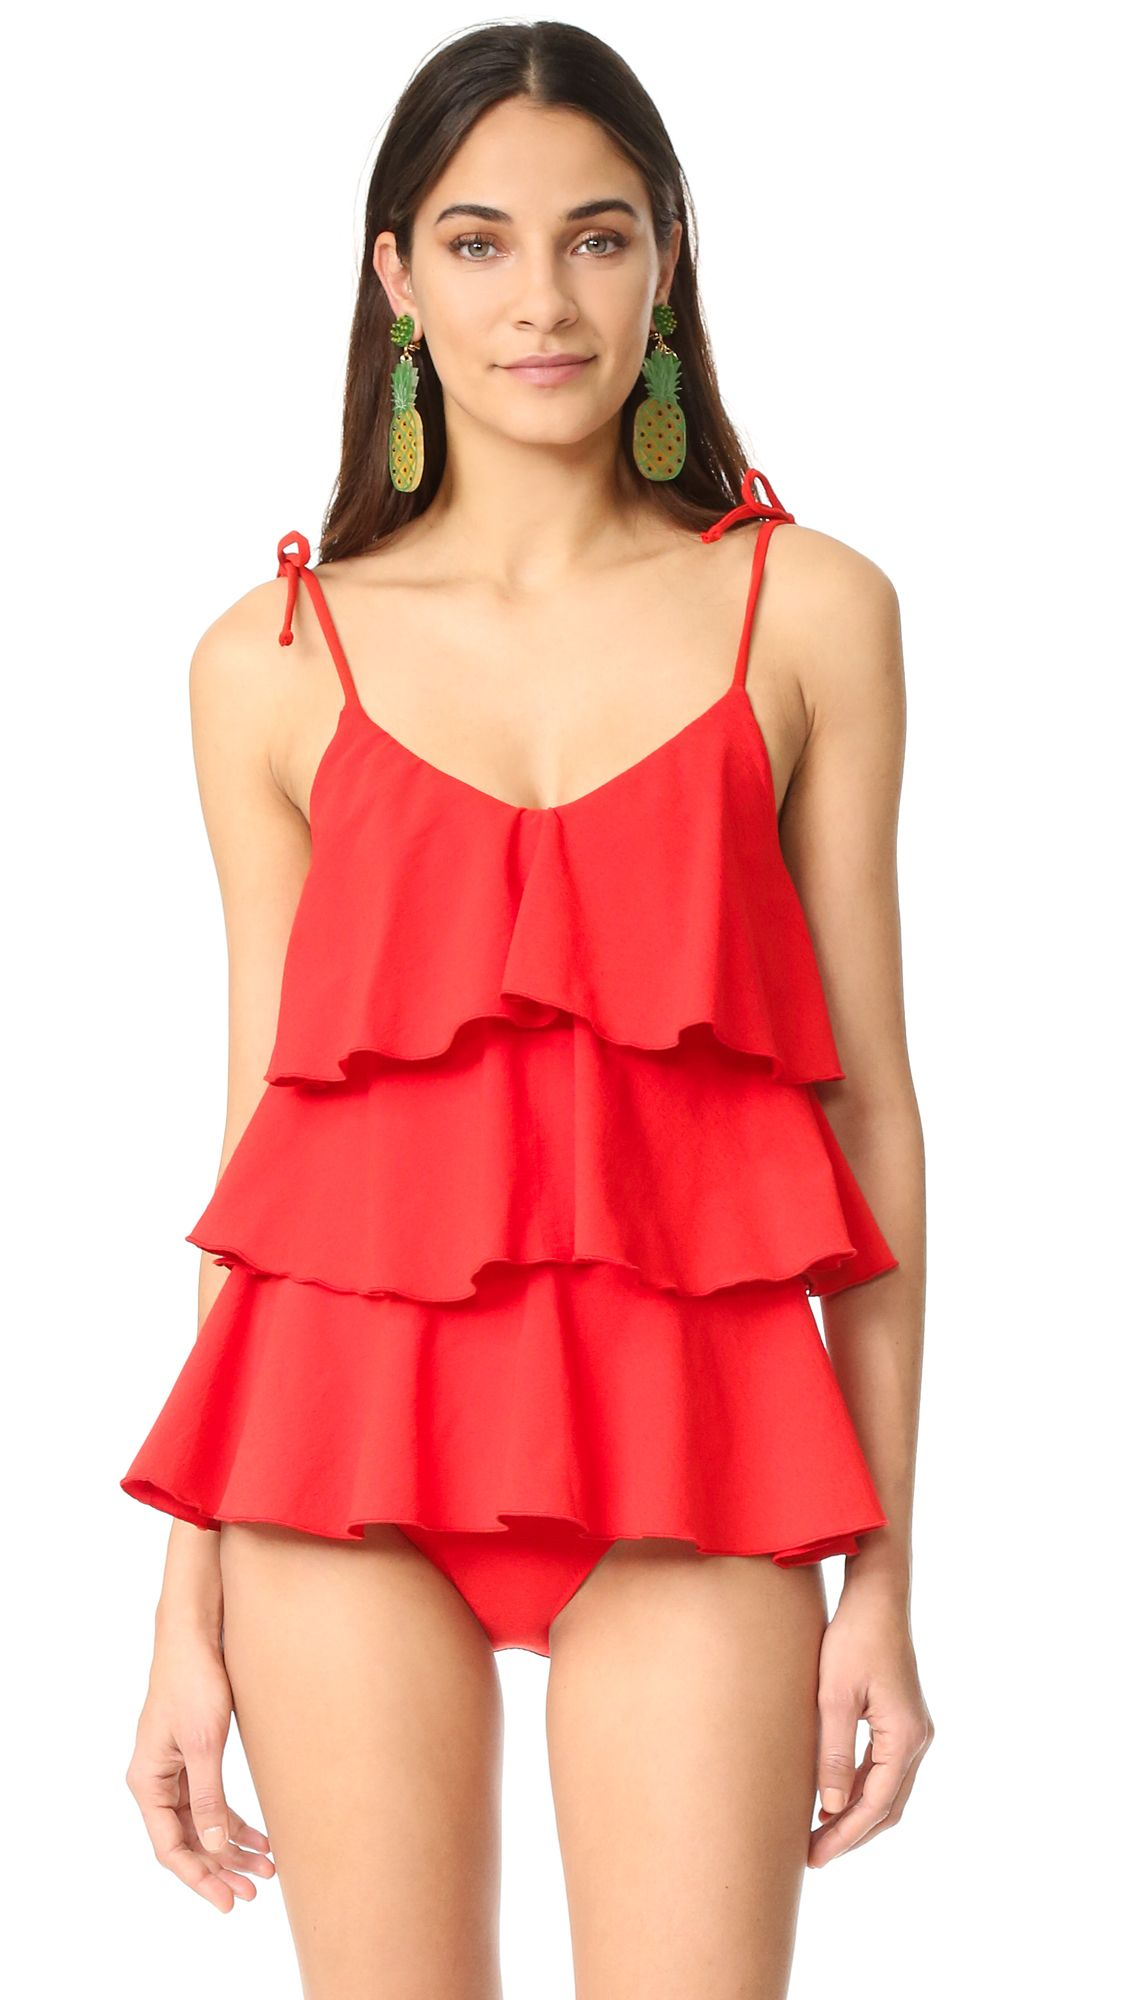 49b6eefb6e2bf9 Lisa Marie Fernandez Imaan Ruffle Swimsuit - Tomato Crepe. A playful Lisa  Marie Fernandez one piece swimsuit with flirty ruffles. Adjustable shoulder  ties.